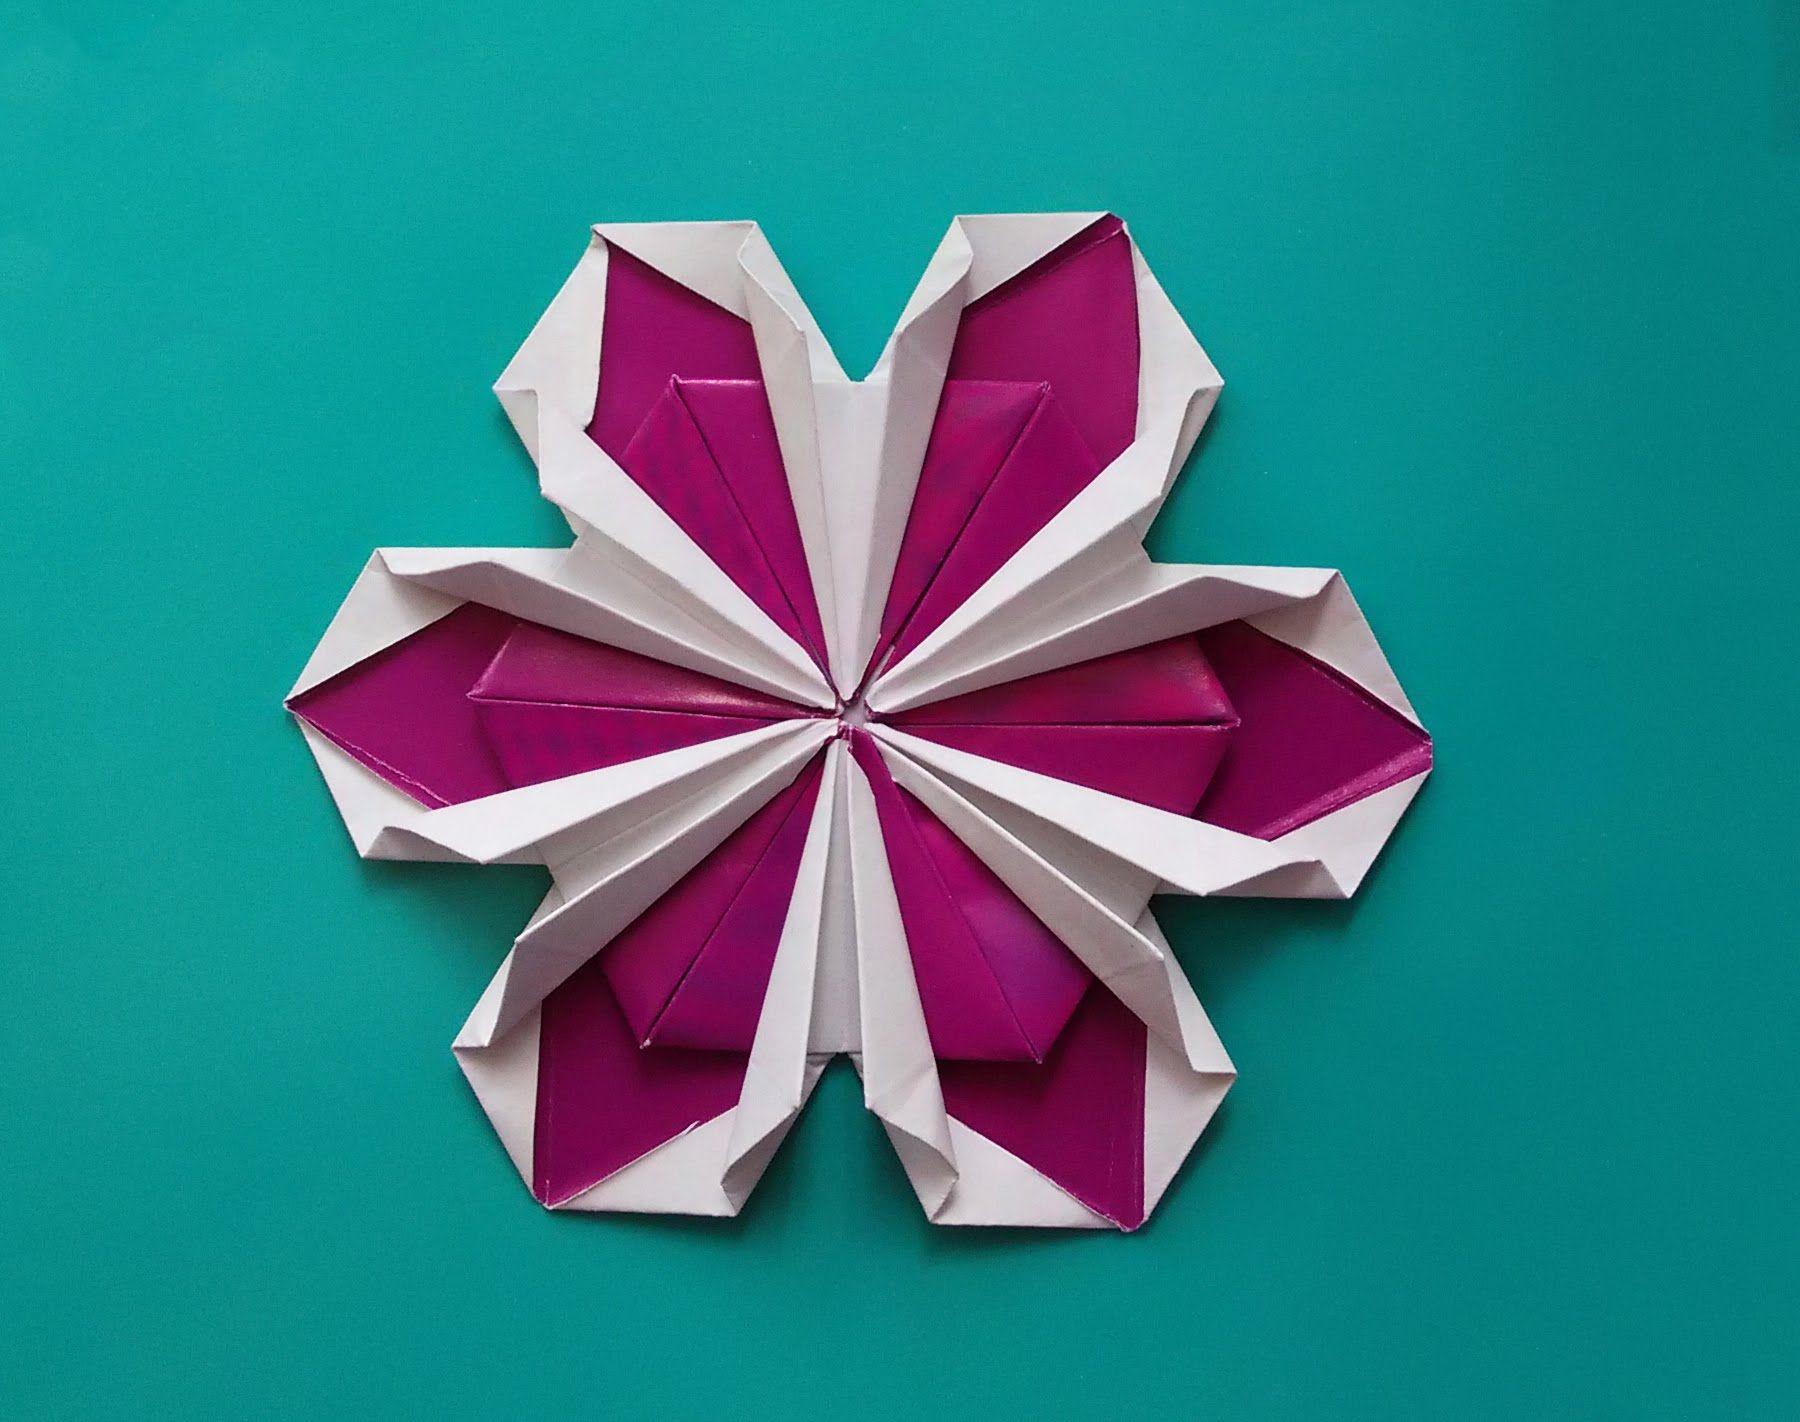 Designed by zoryana sonsyadlo delhi flower amazing origami flower designed by zoryana sonsyadlo delhi flower amazing origami flower star 3d paper flower mightylinksfo Images